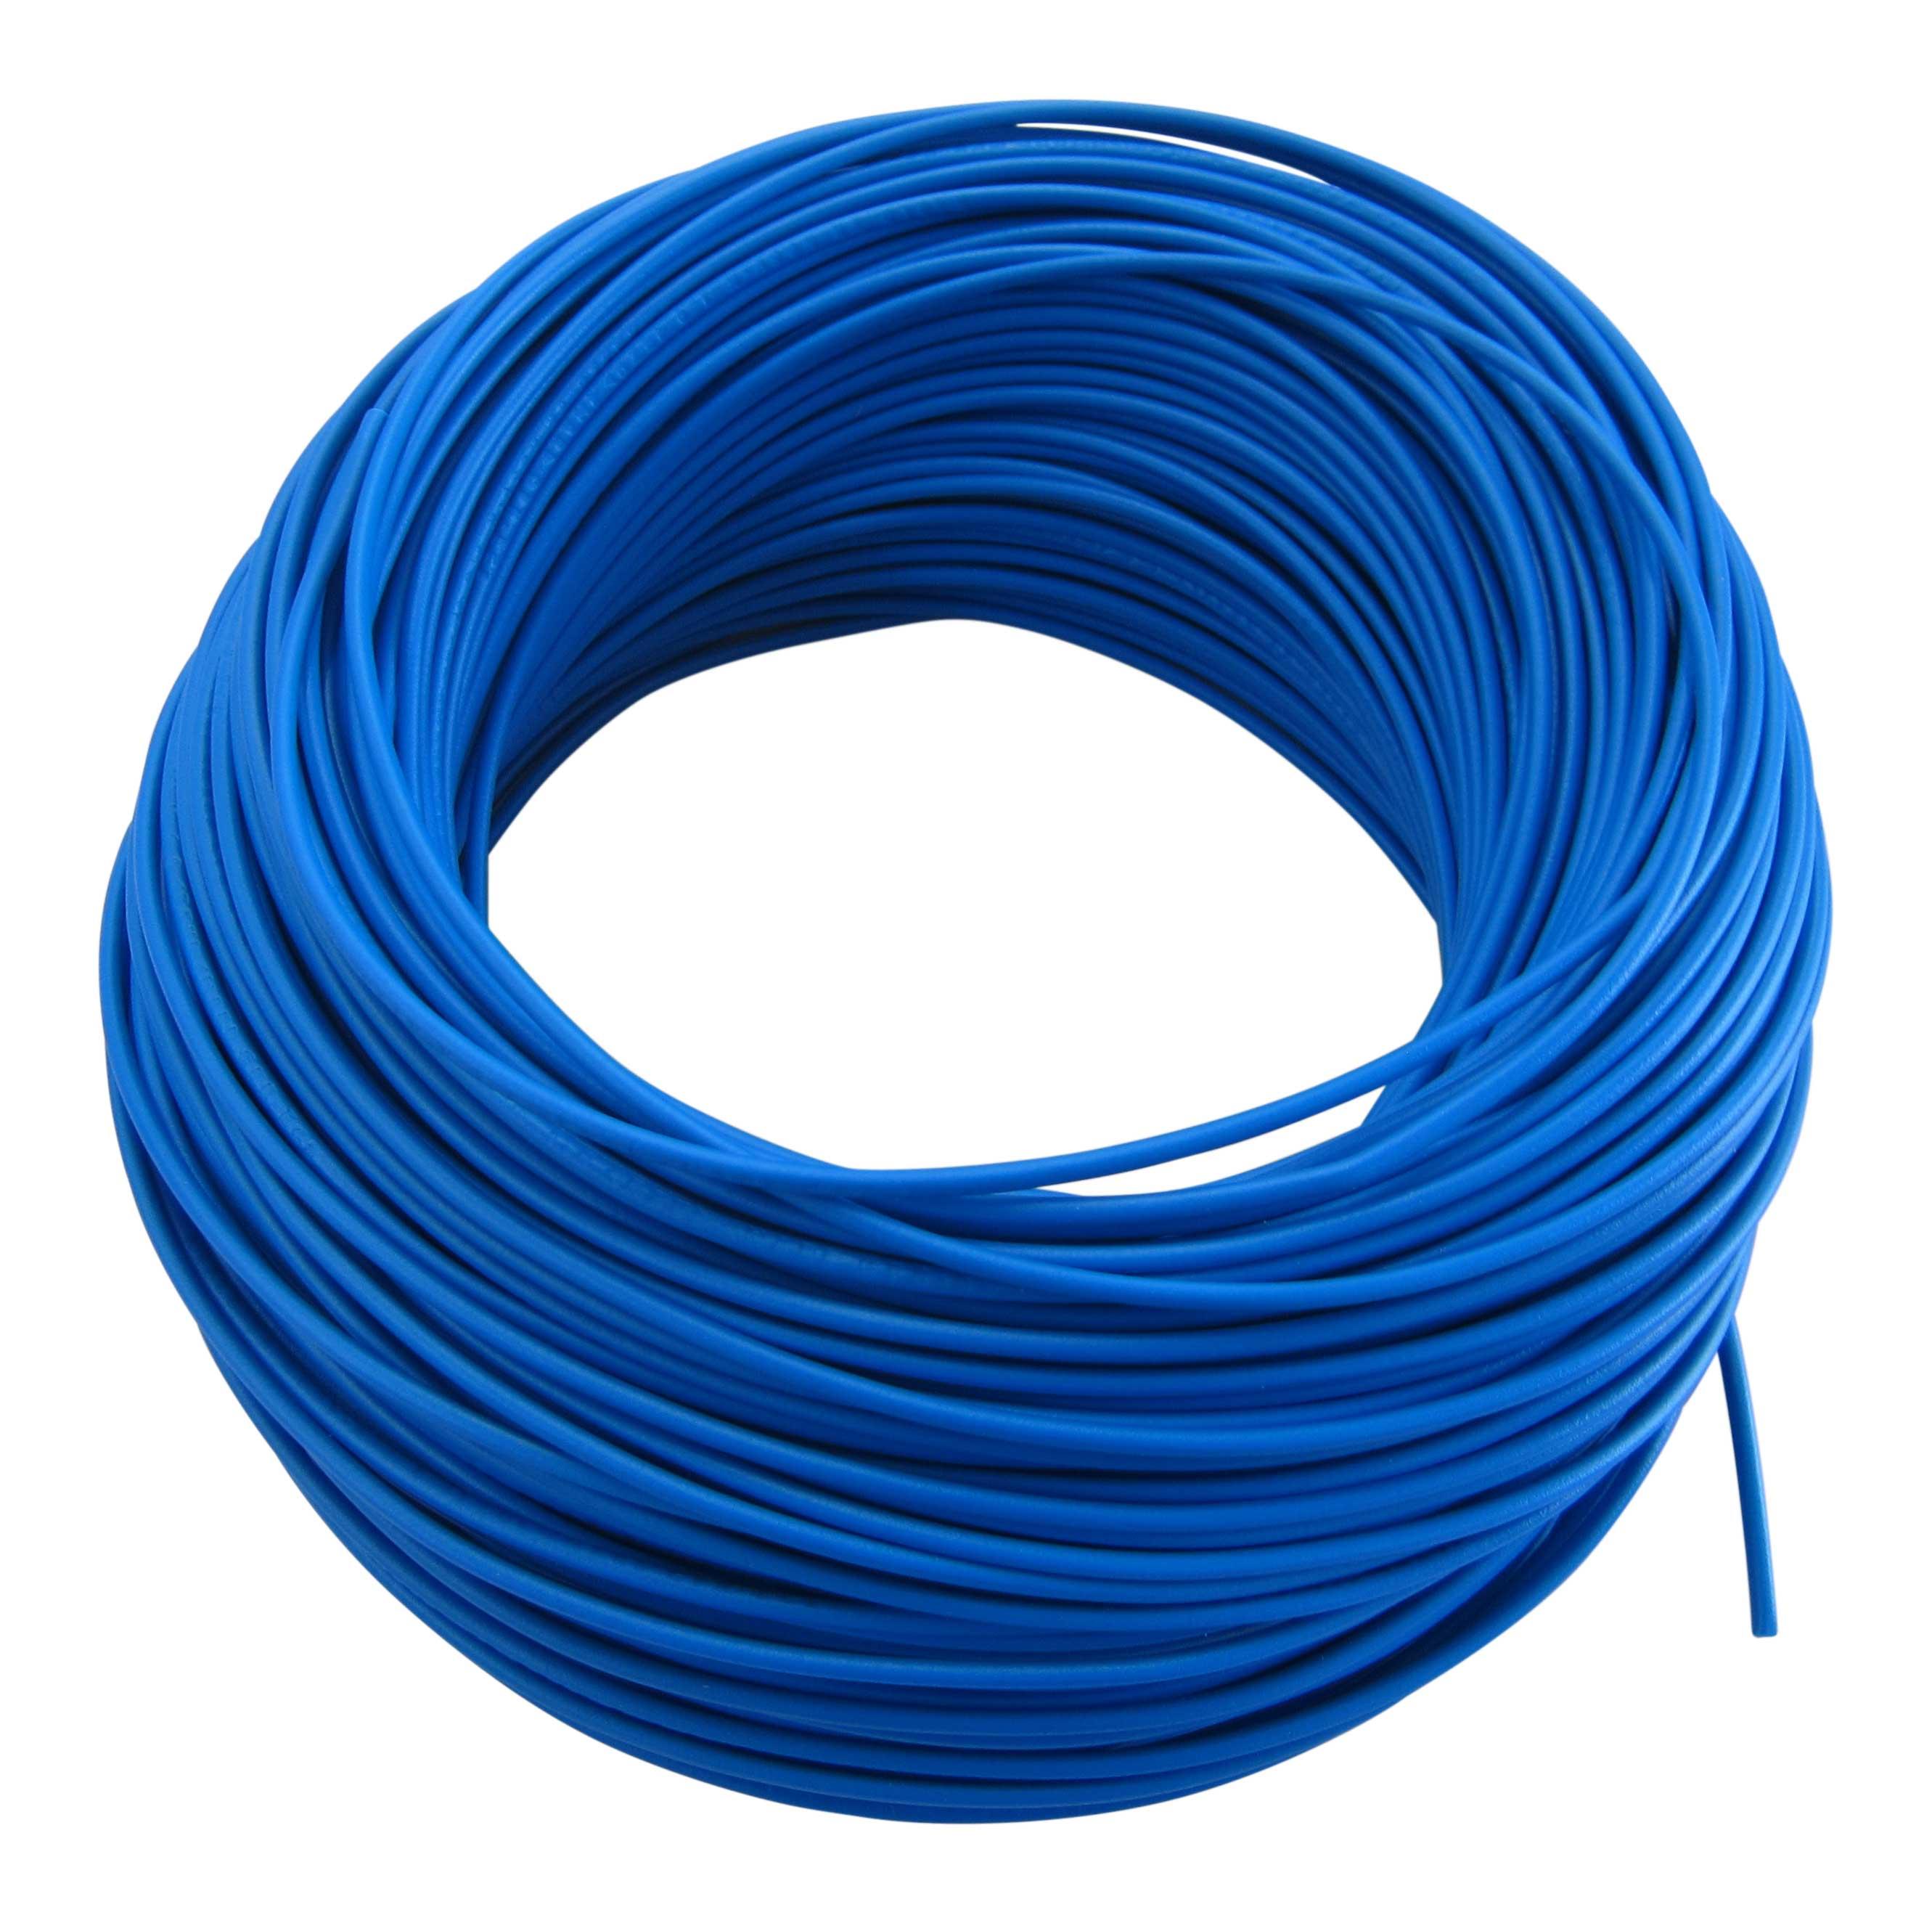 0,31€/m KFZ LKW Kabel Litze Leitung Flexible FLRy 0,75mm² 20m Blau M. in Germany